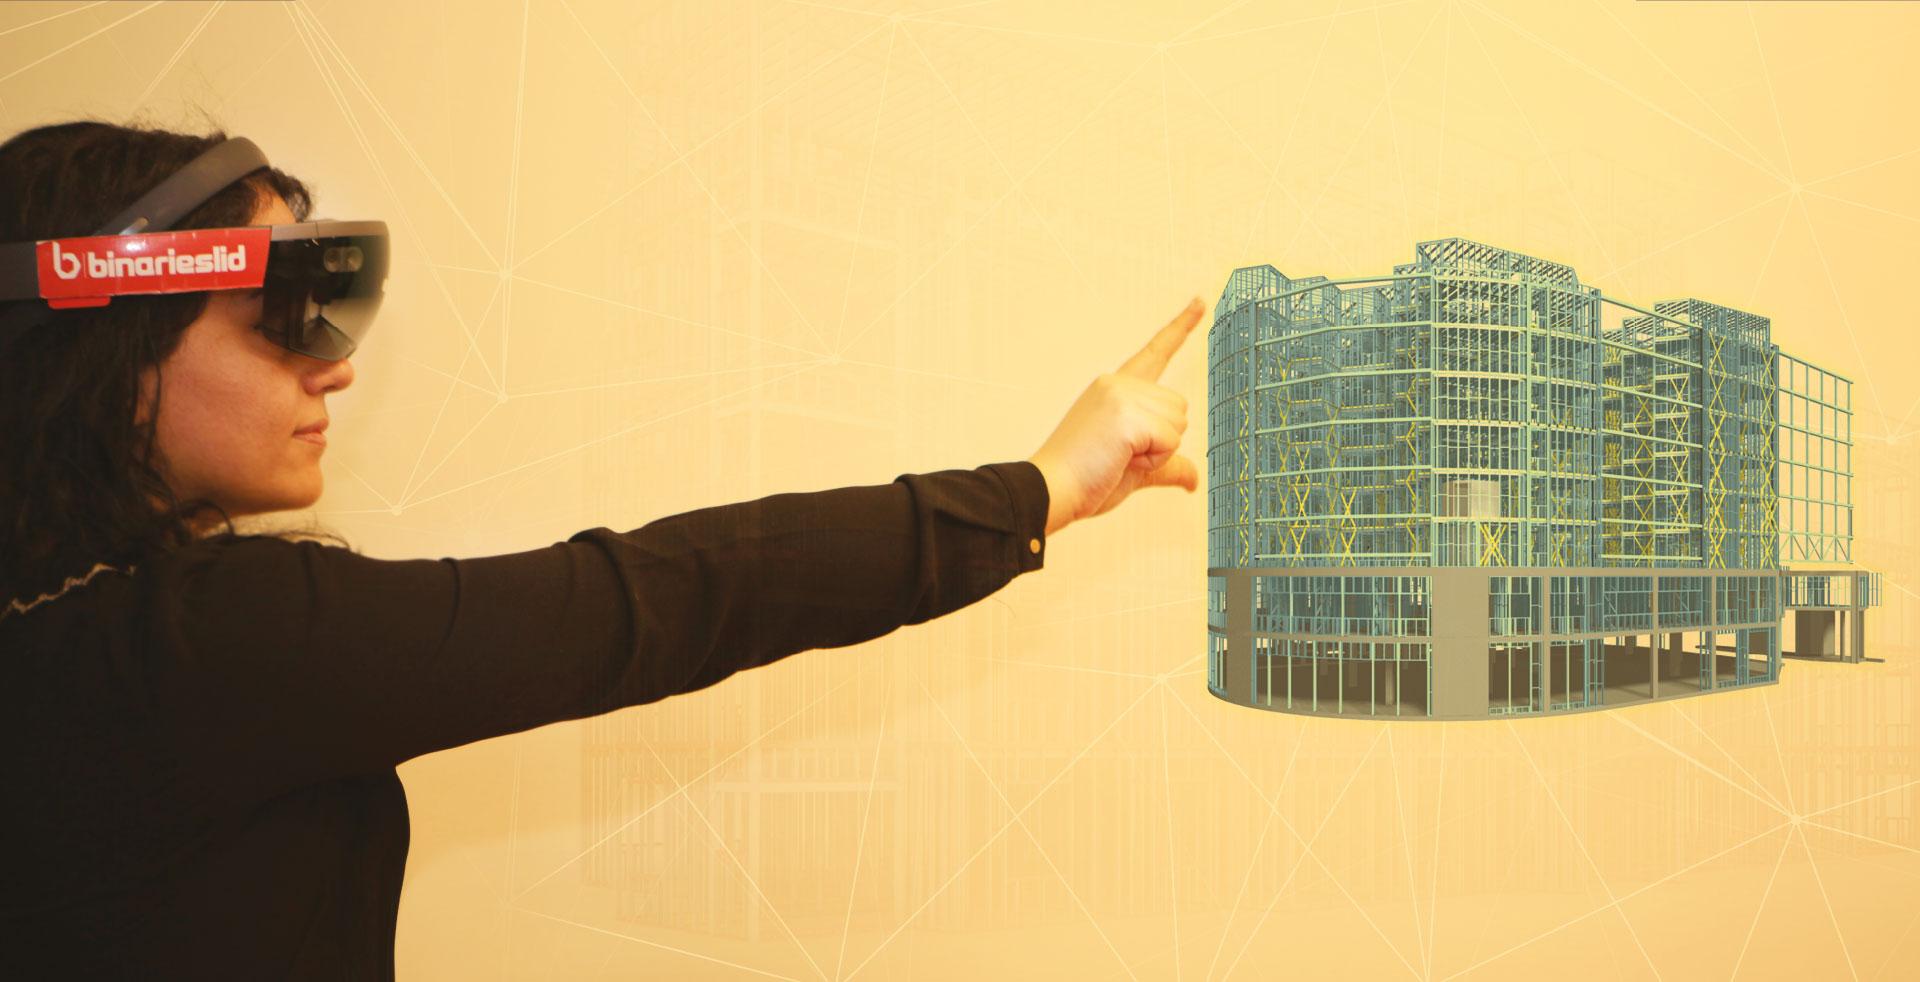 buildwagon — HoloLens Development Platform